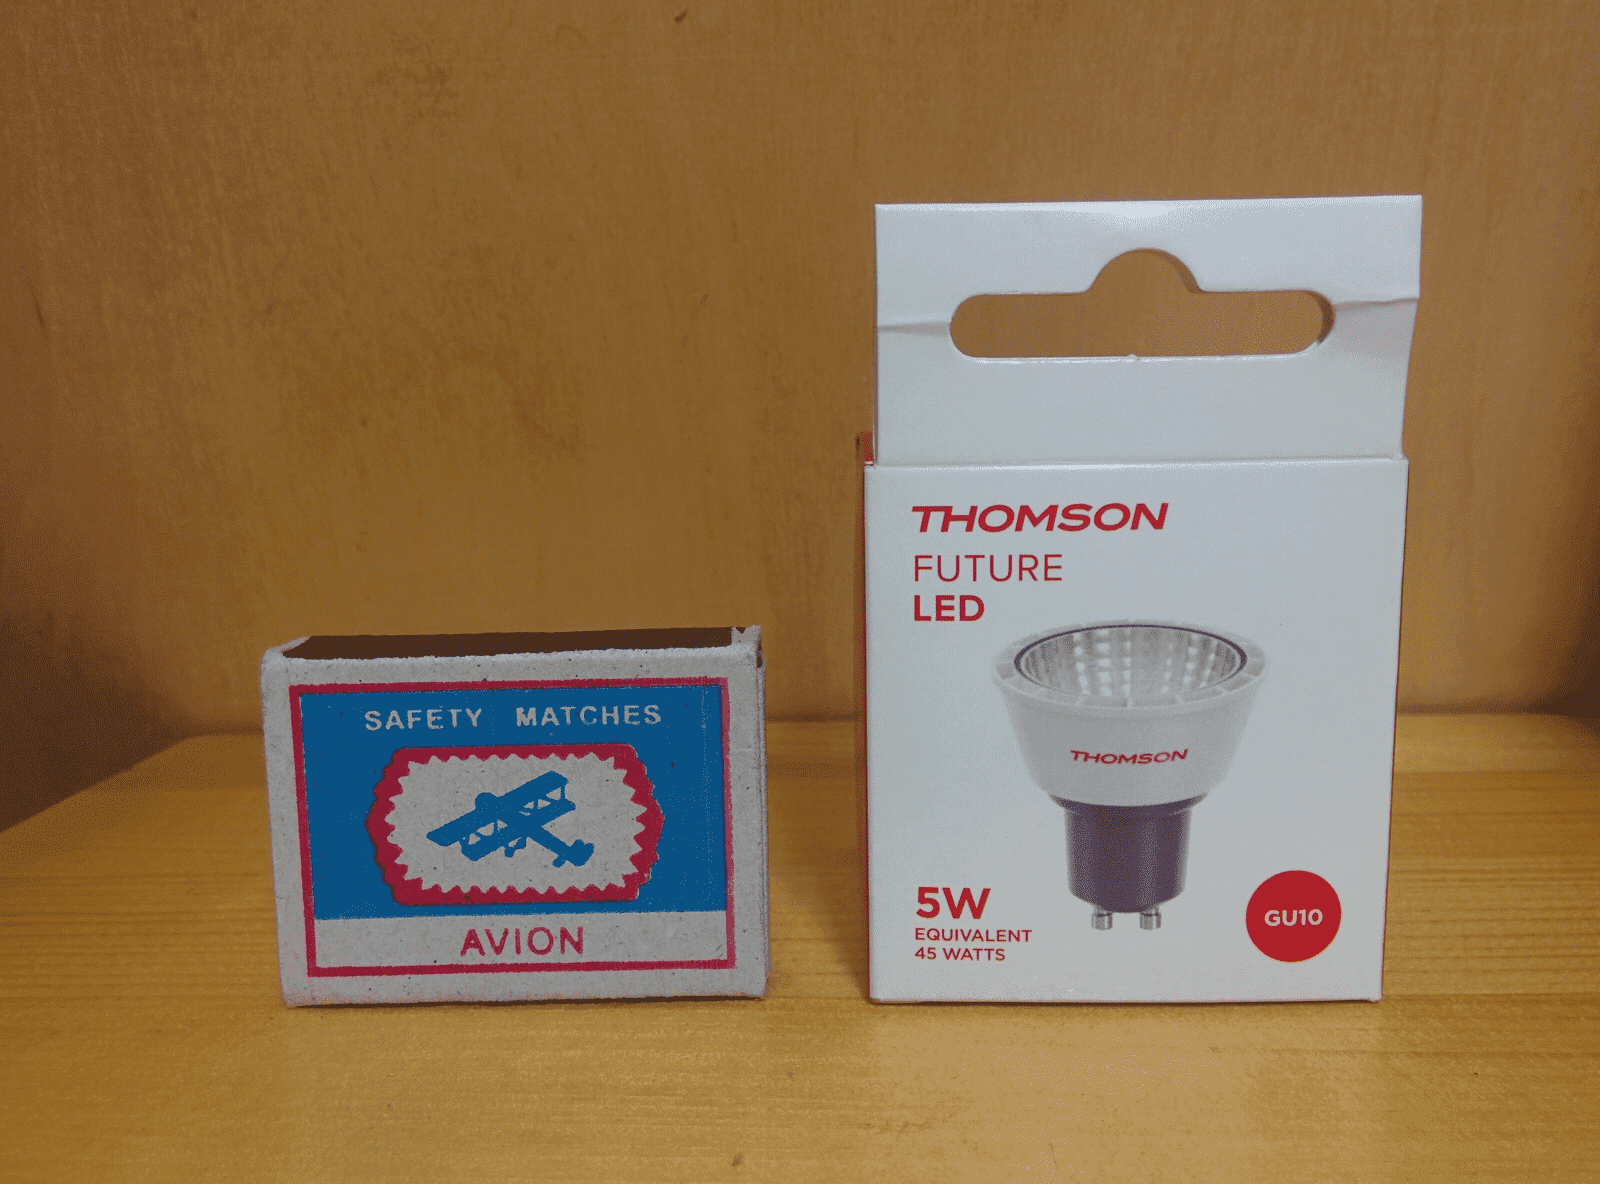 Thomson TL-MR16W-5W220V упаковка